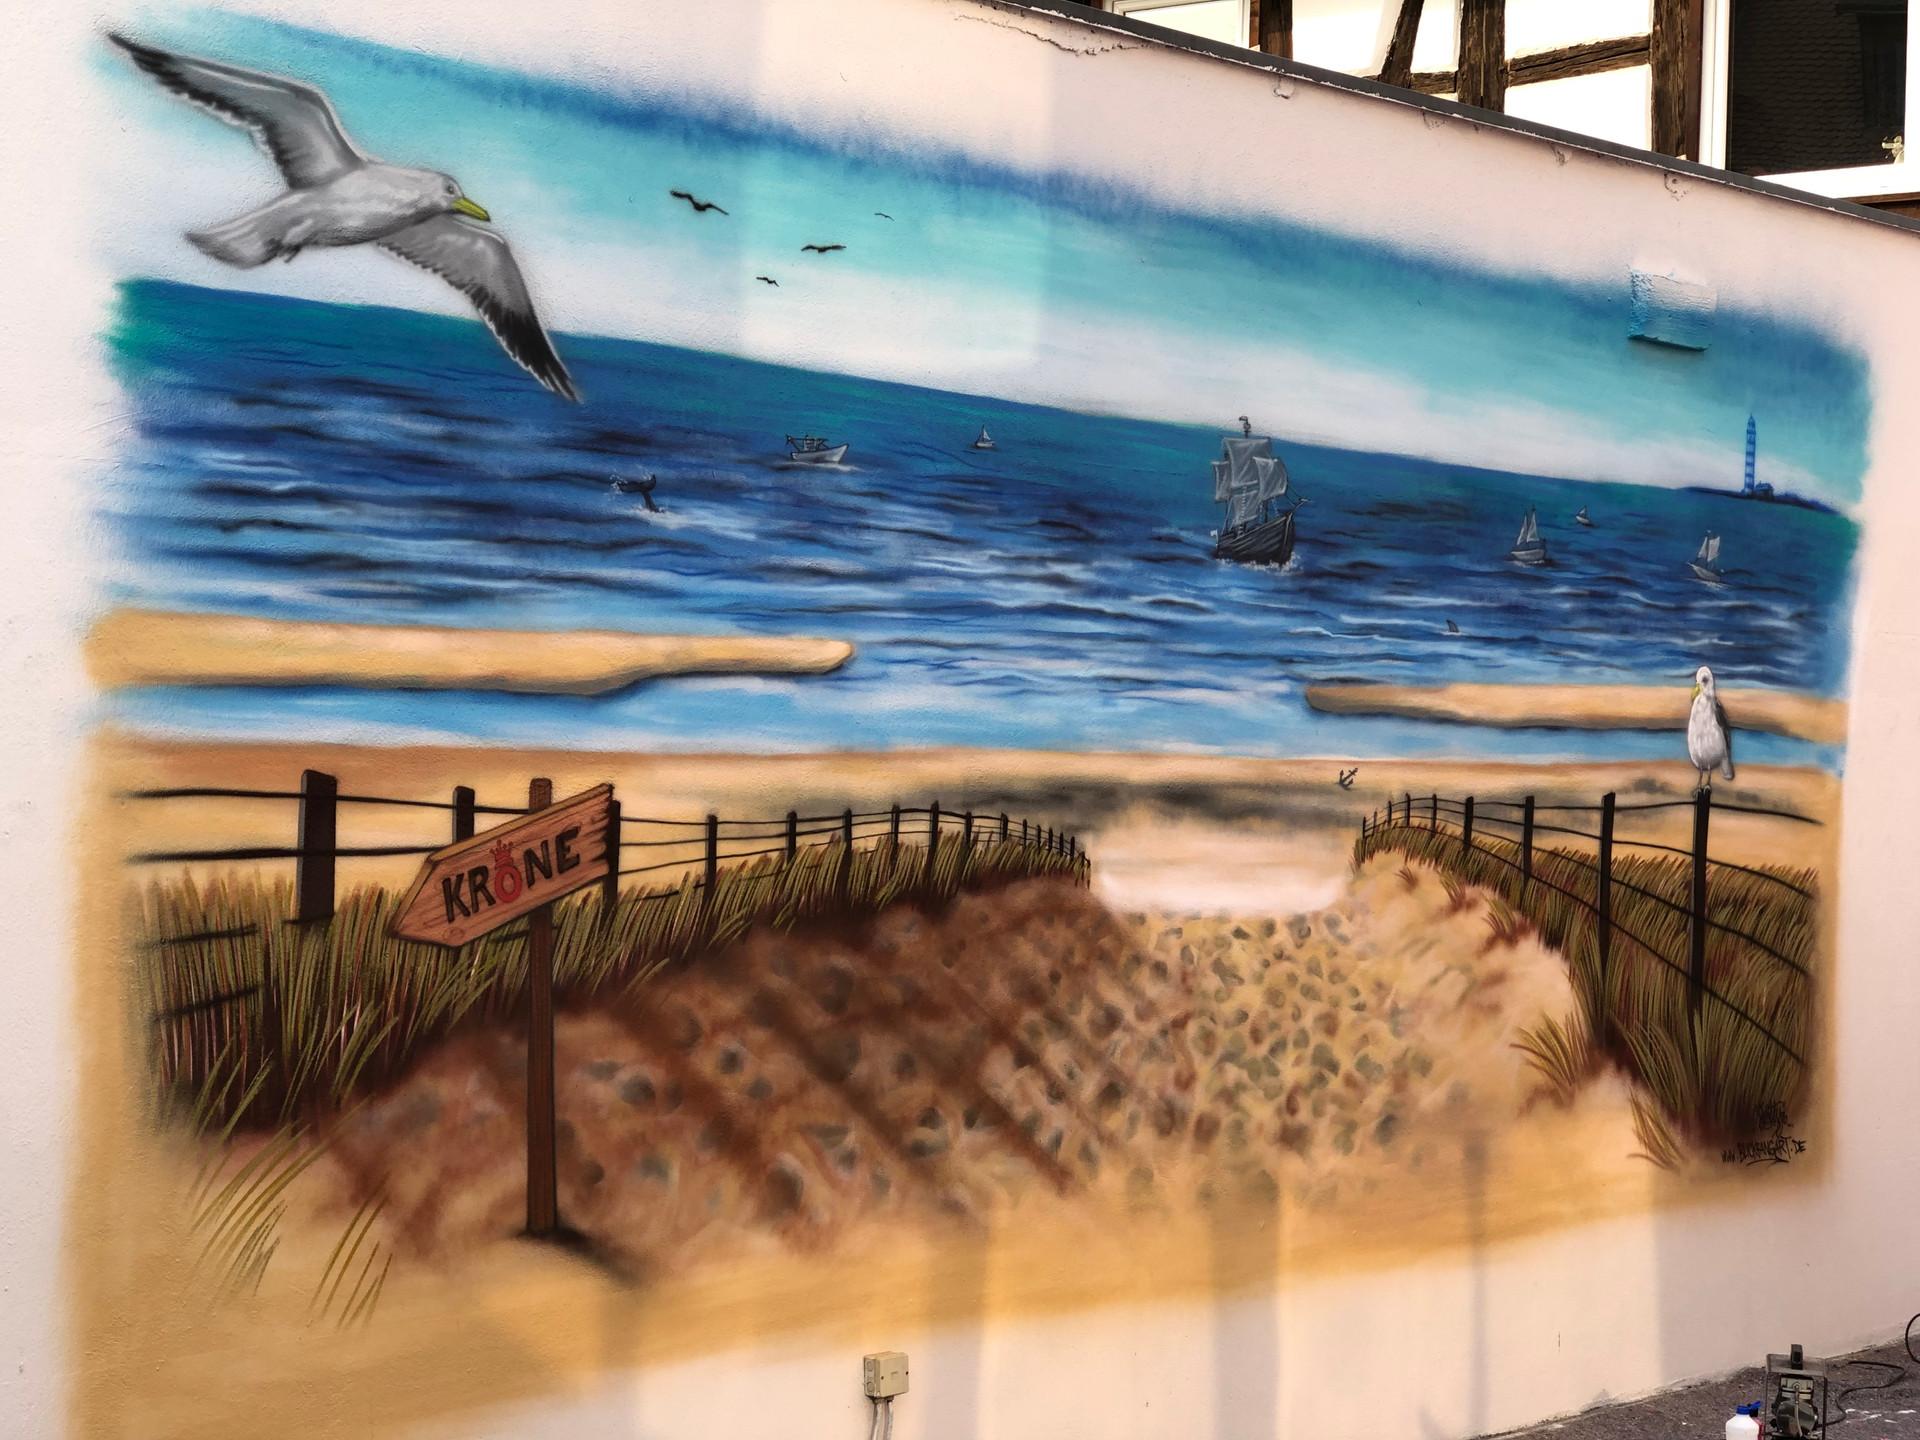 Strand Graffiti